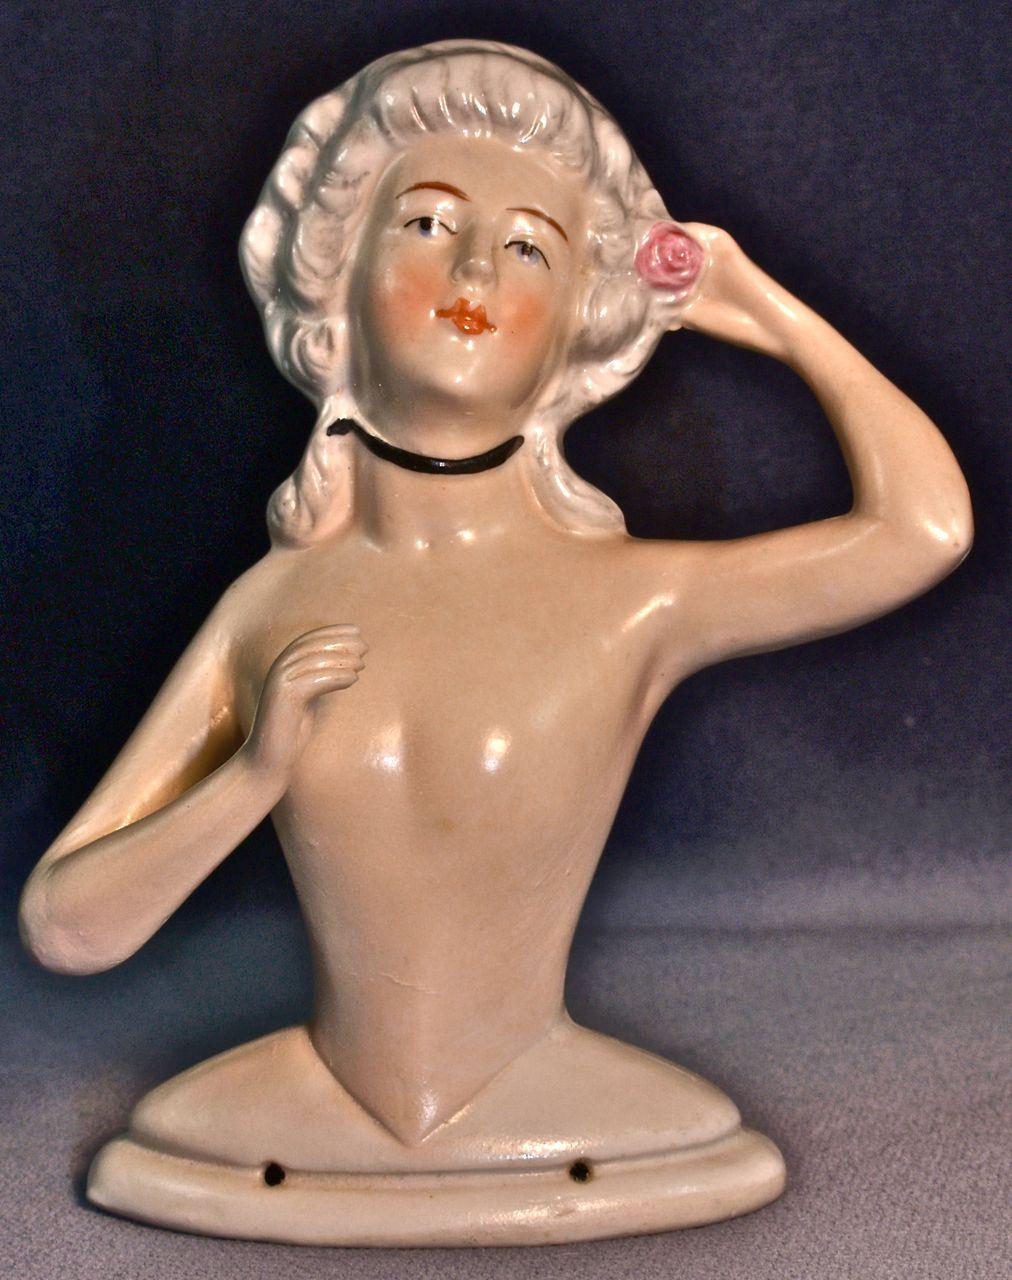 KARL SCHNEIDER  (Signed) Large Nude Half-Doll Placing a Pink Rose in Her Grey Pompadour Hair